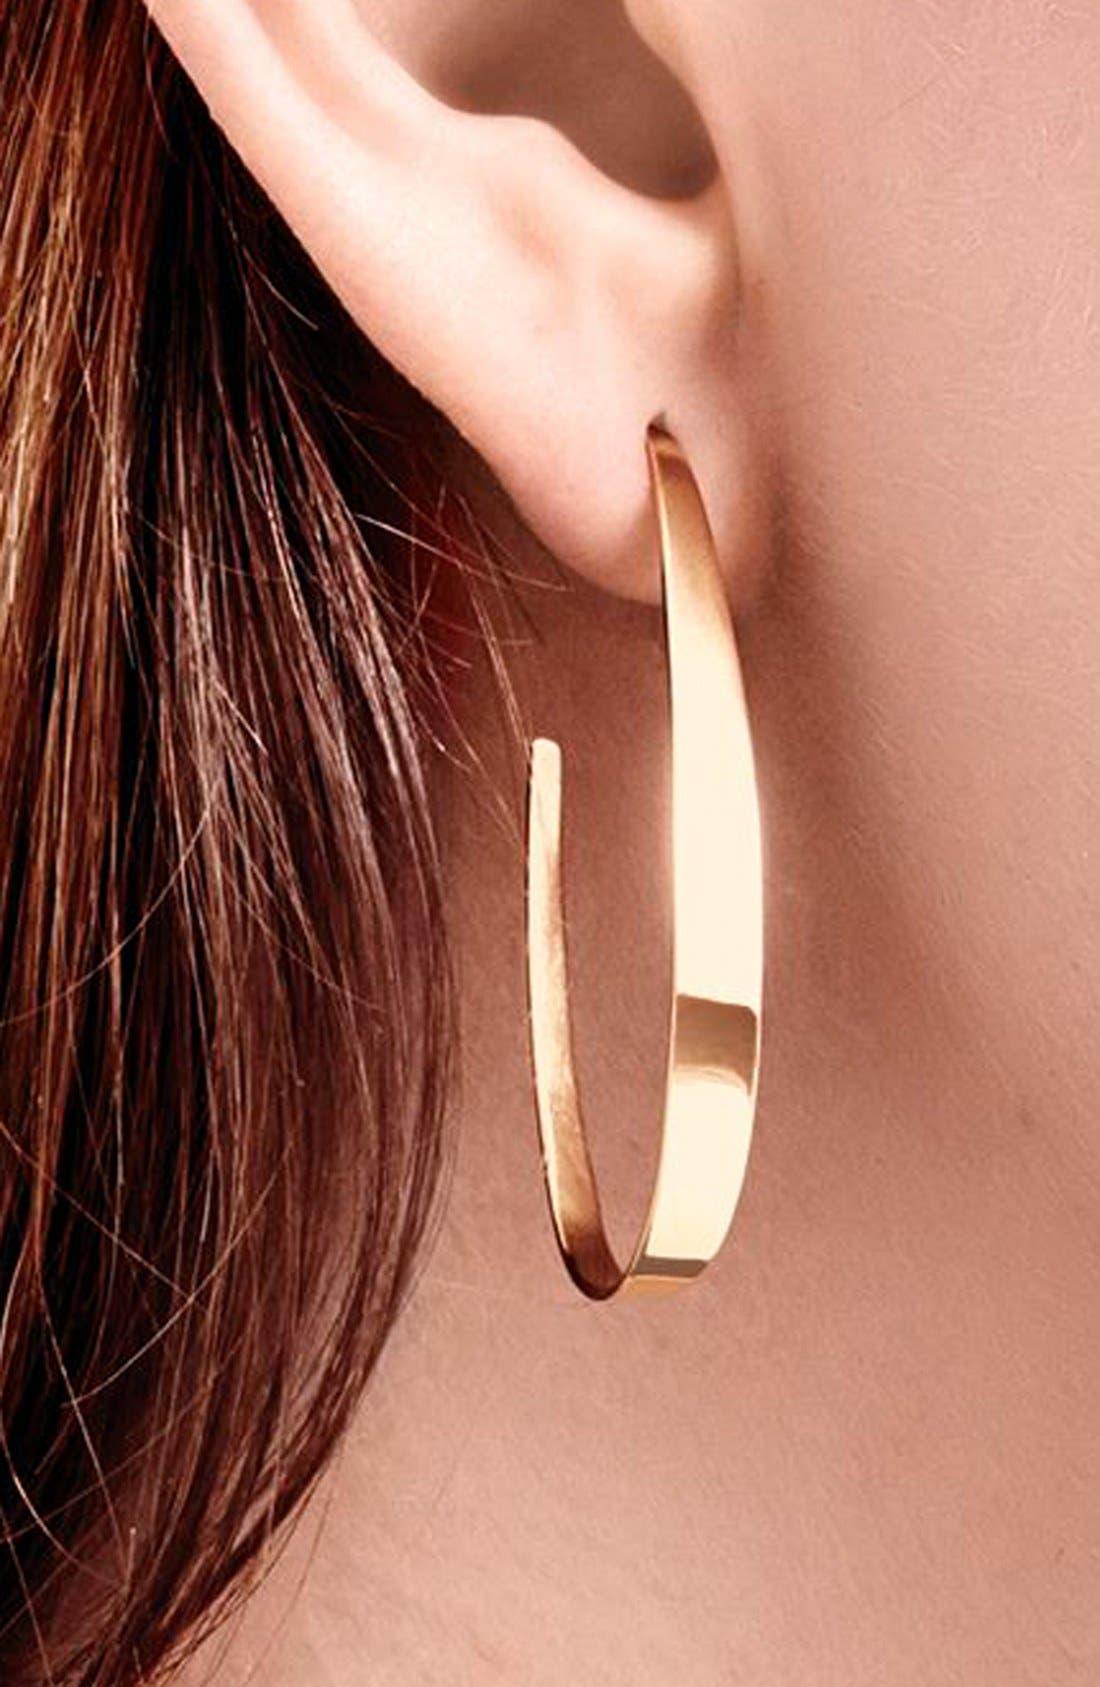 Oval Hoop Earrings,                             Alternate thumbnail 2, color,                             710